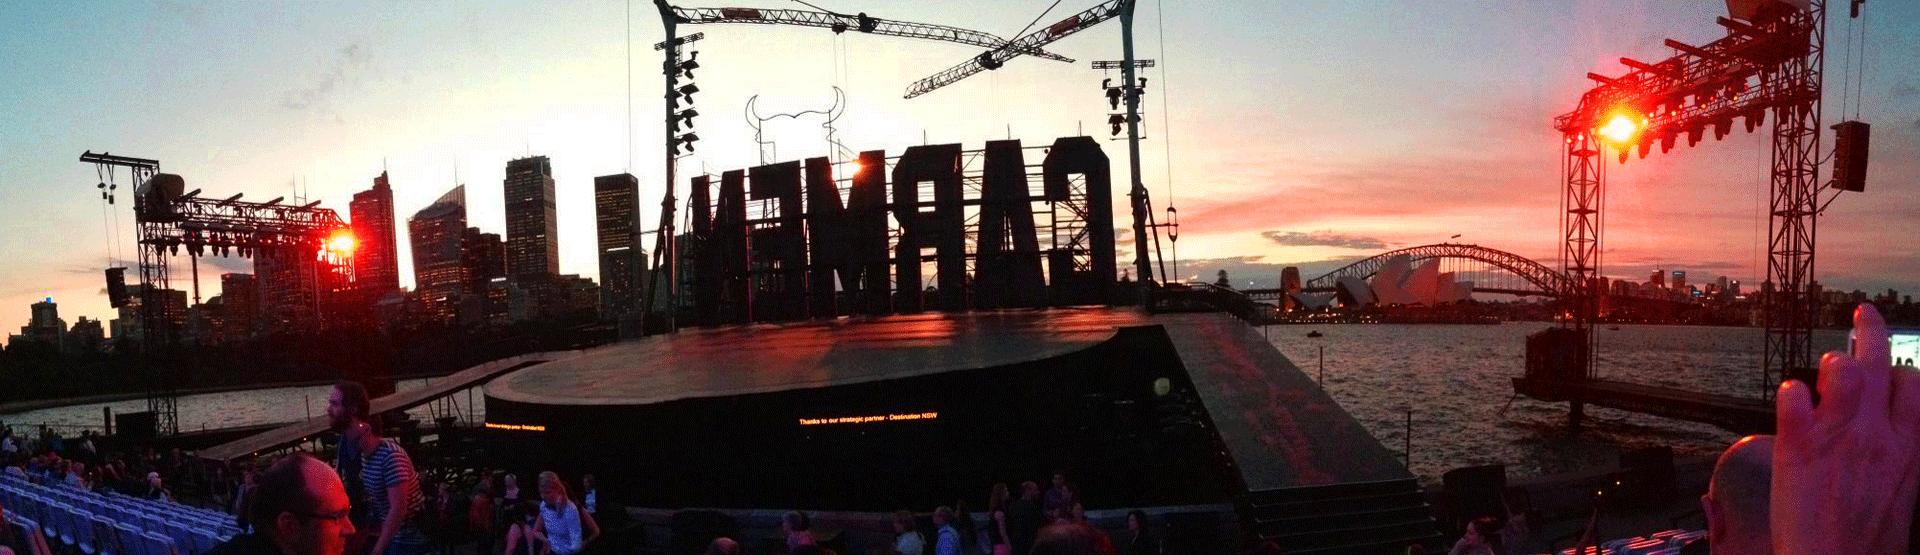 Opera on Sydney Harbour 2013